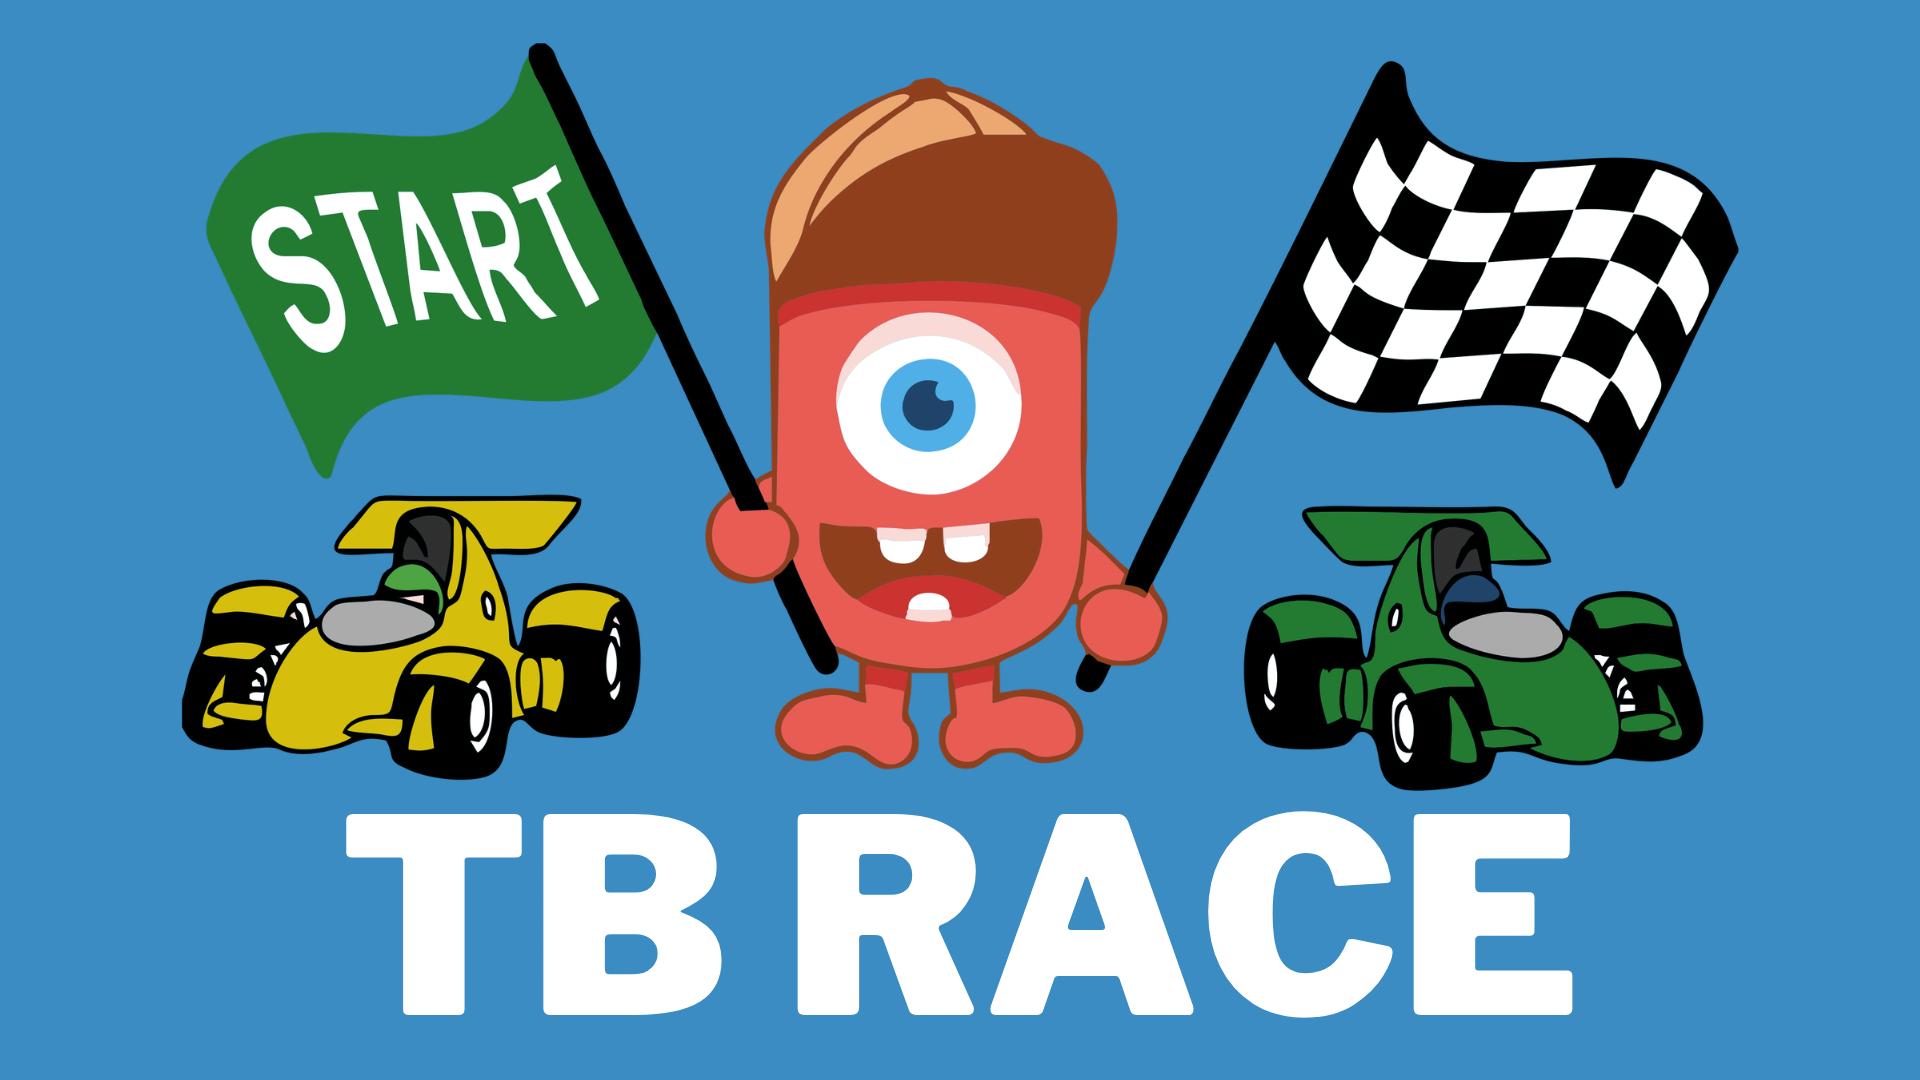 TB Race geocachen 2021